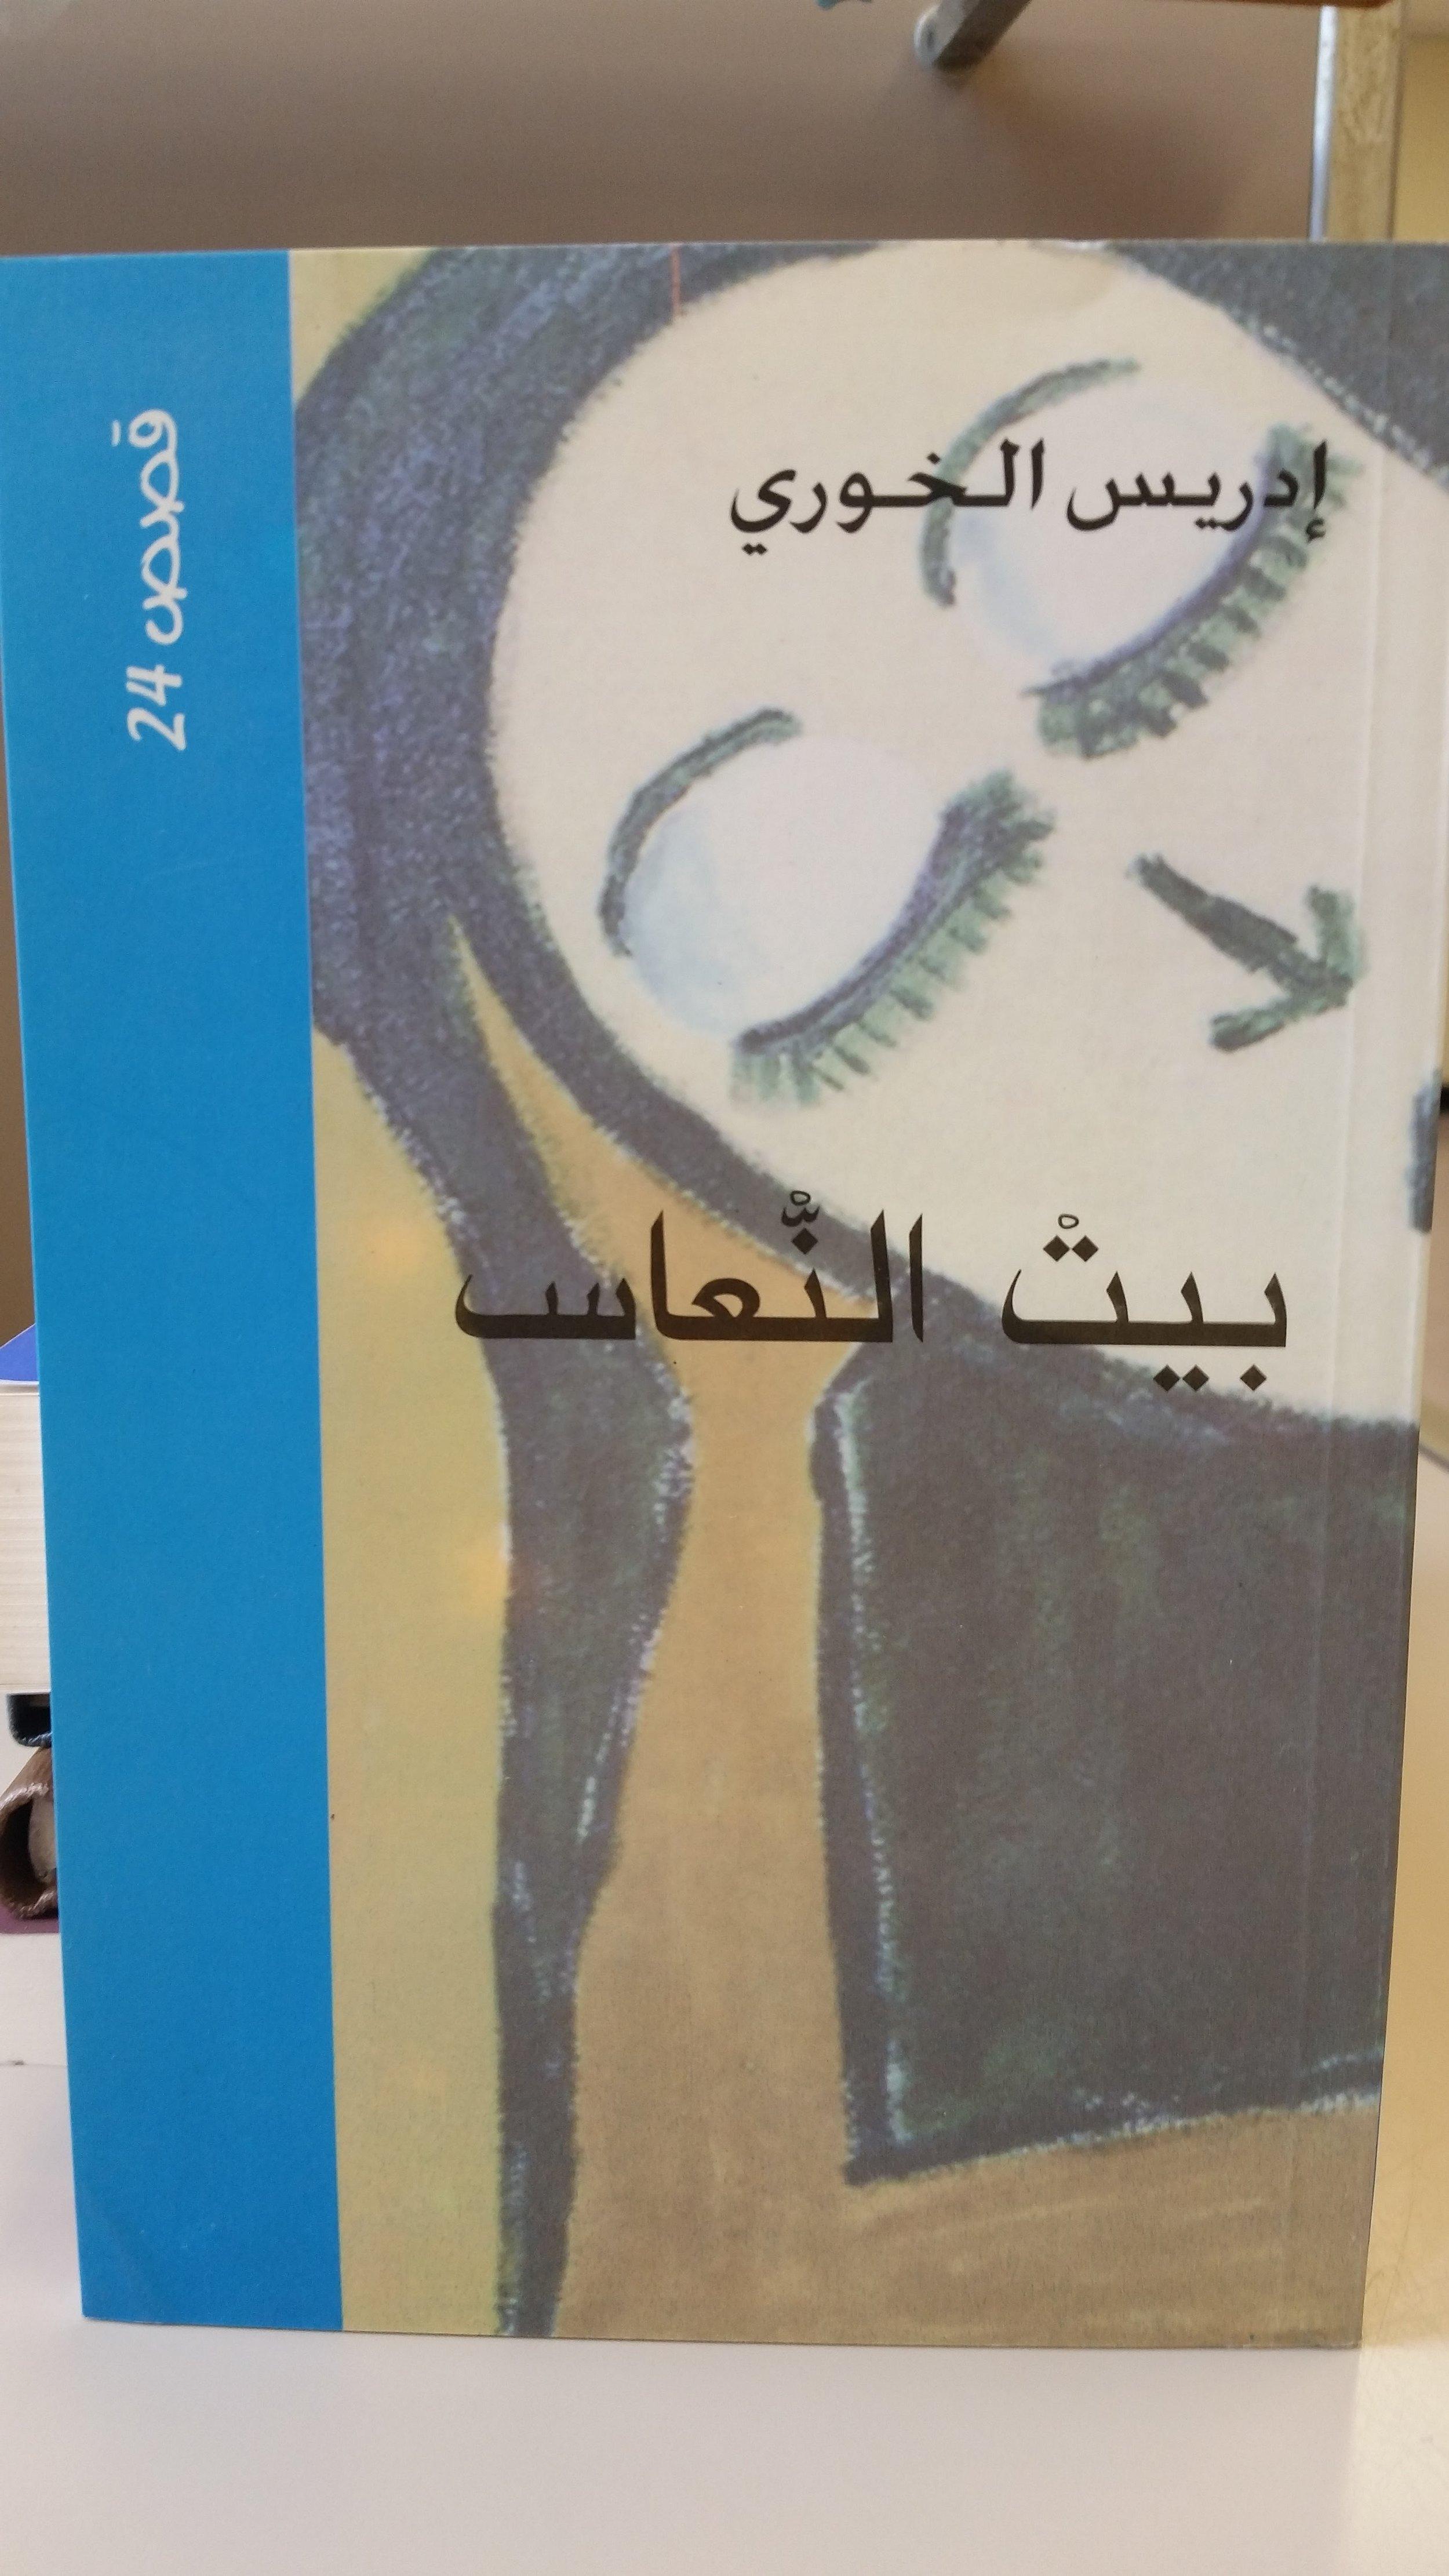 The House of the Tired  by Idrīs Khūrī (al-Dār al-Bayḍā' : Majmūʻat al-Baḥth fī al-Qiṣṣah al-Qaṣīrah bi-l-Maghrib, 2008)  Short stories